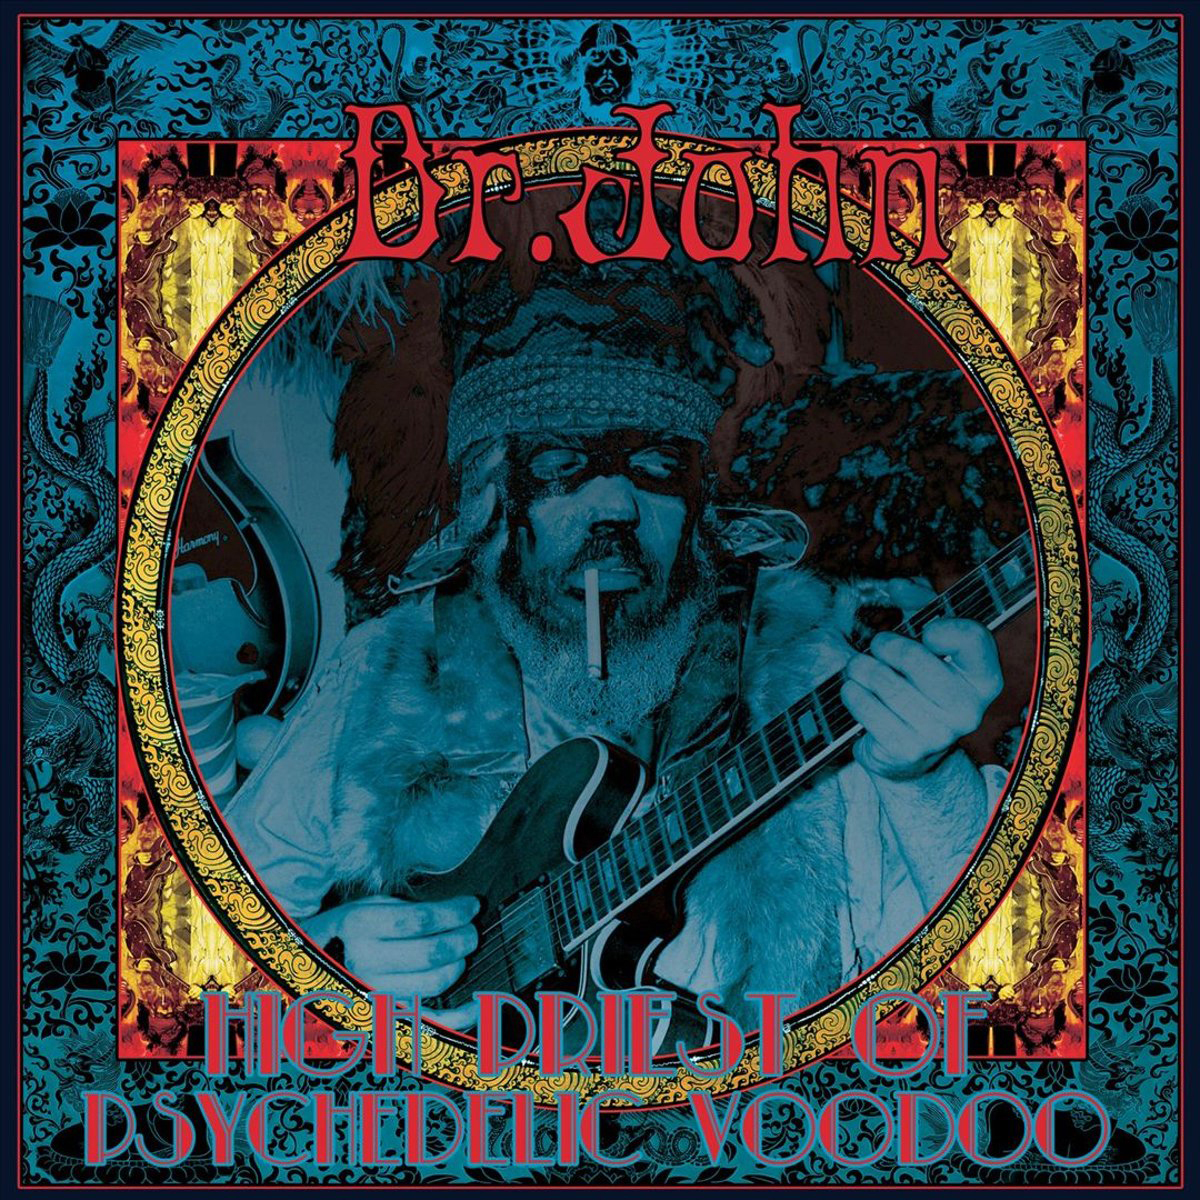 Dr John  High Priest Of Psychedelic Voodoo 2 CD